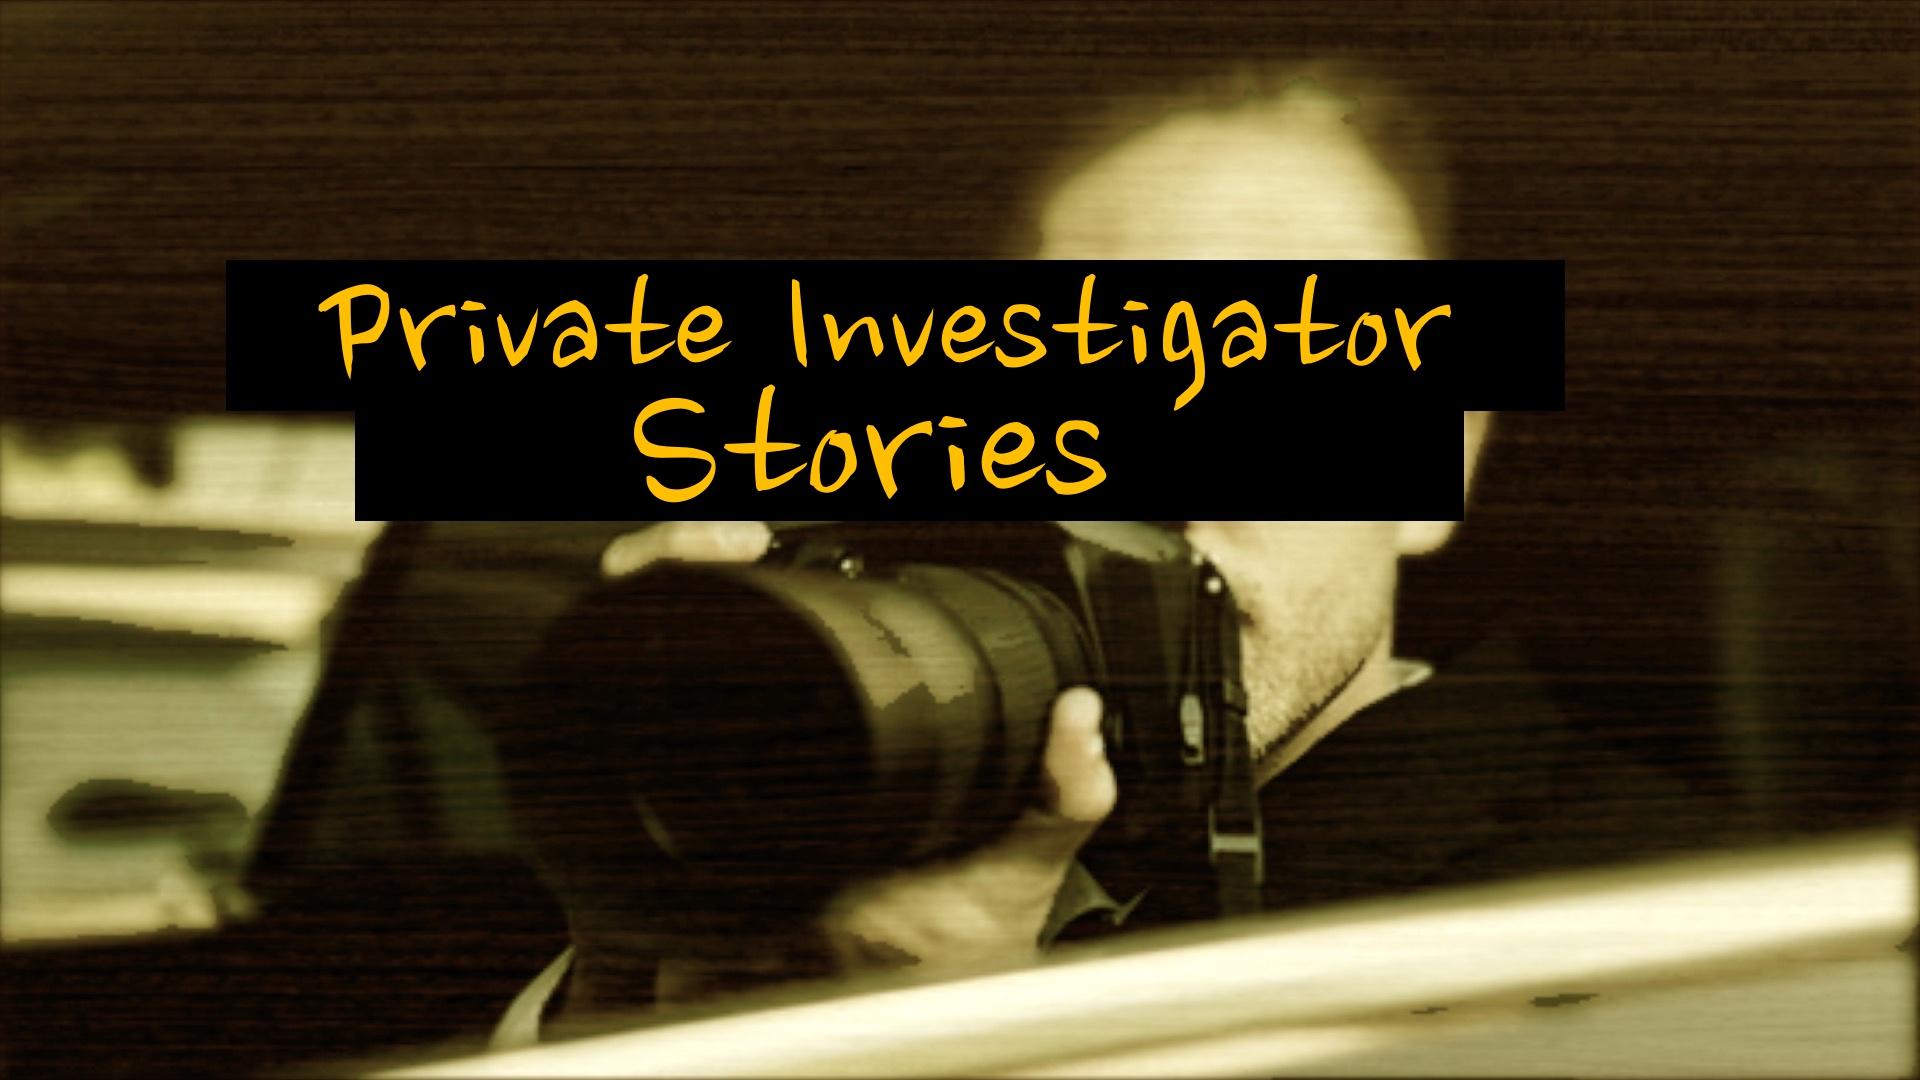 Watch Private Investigator Stories | Prime Video